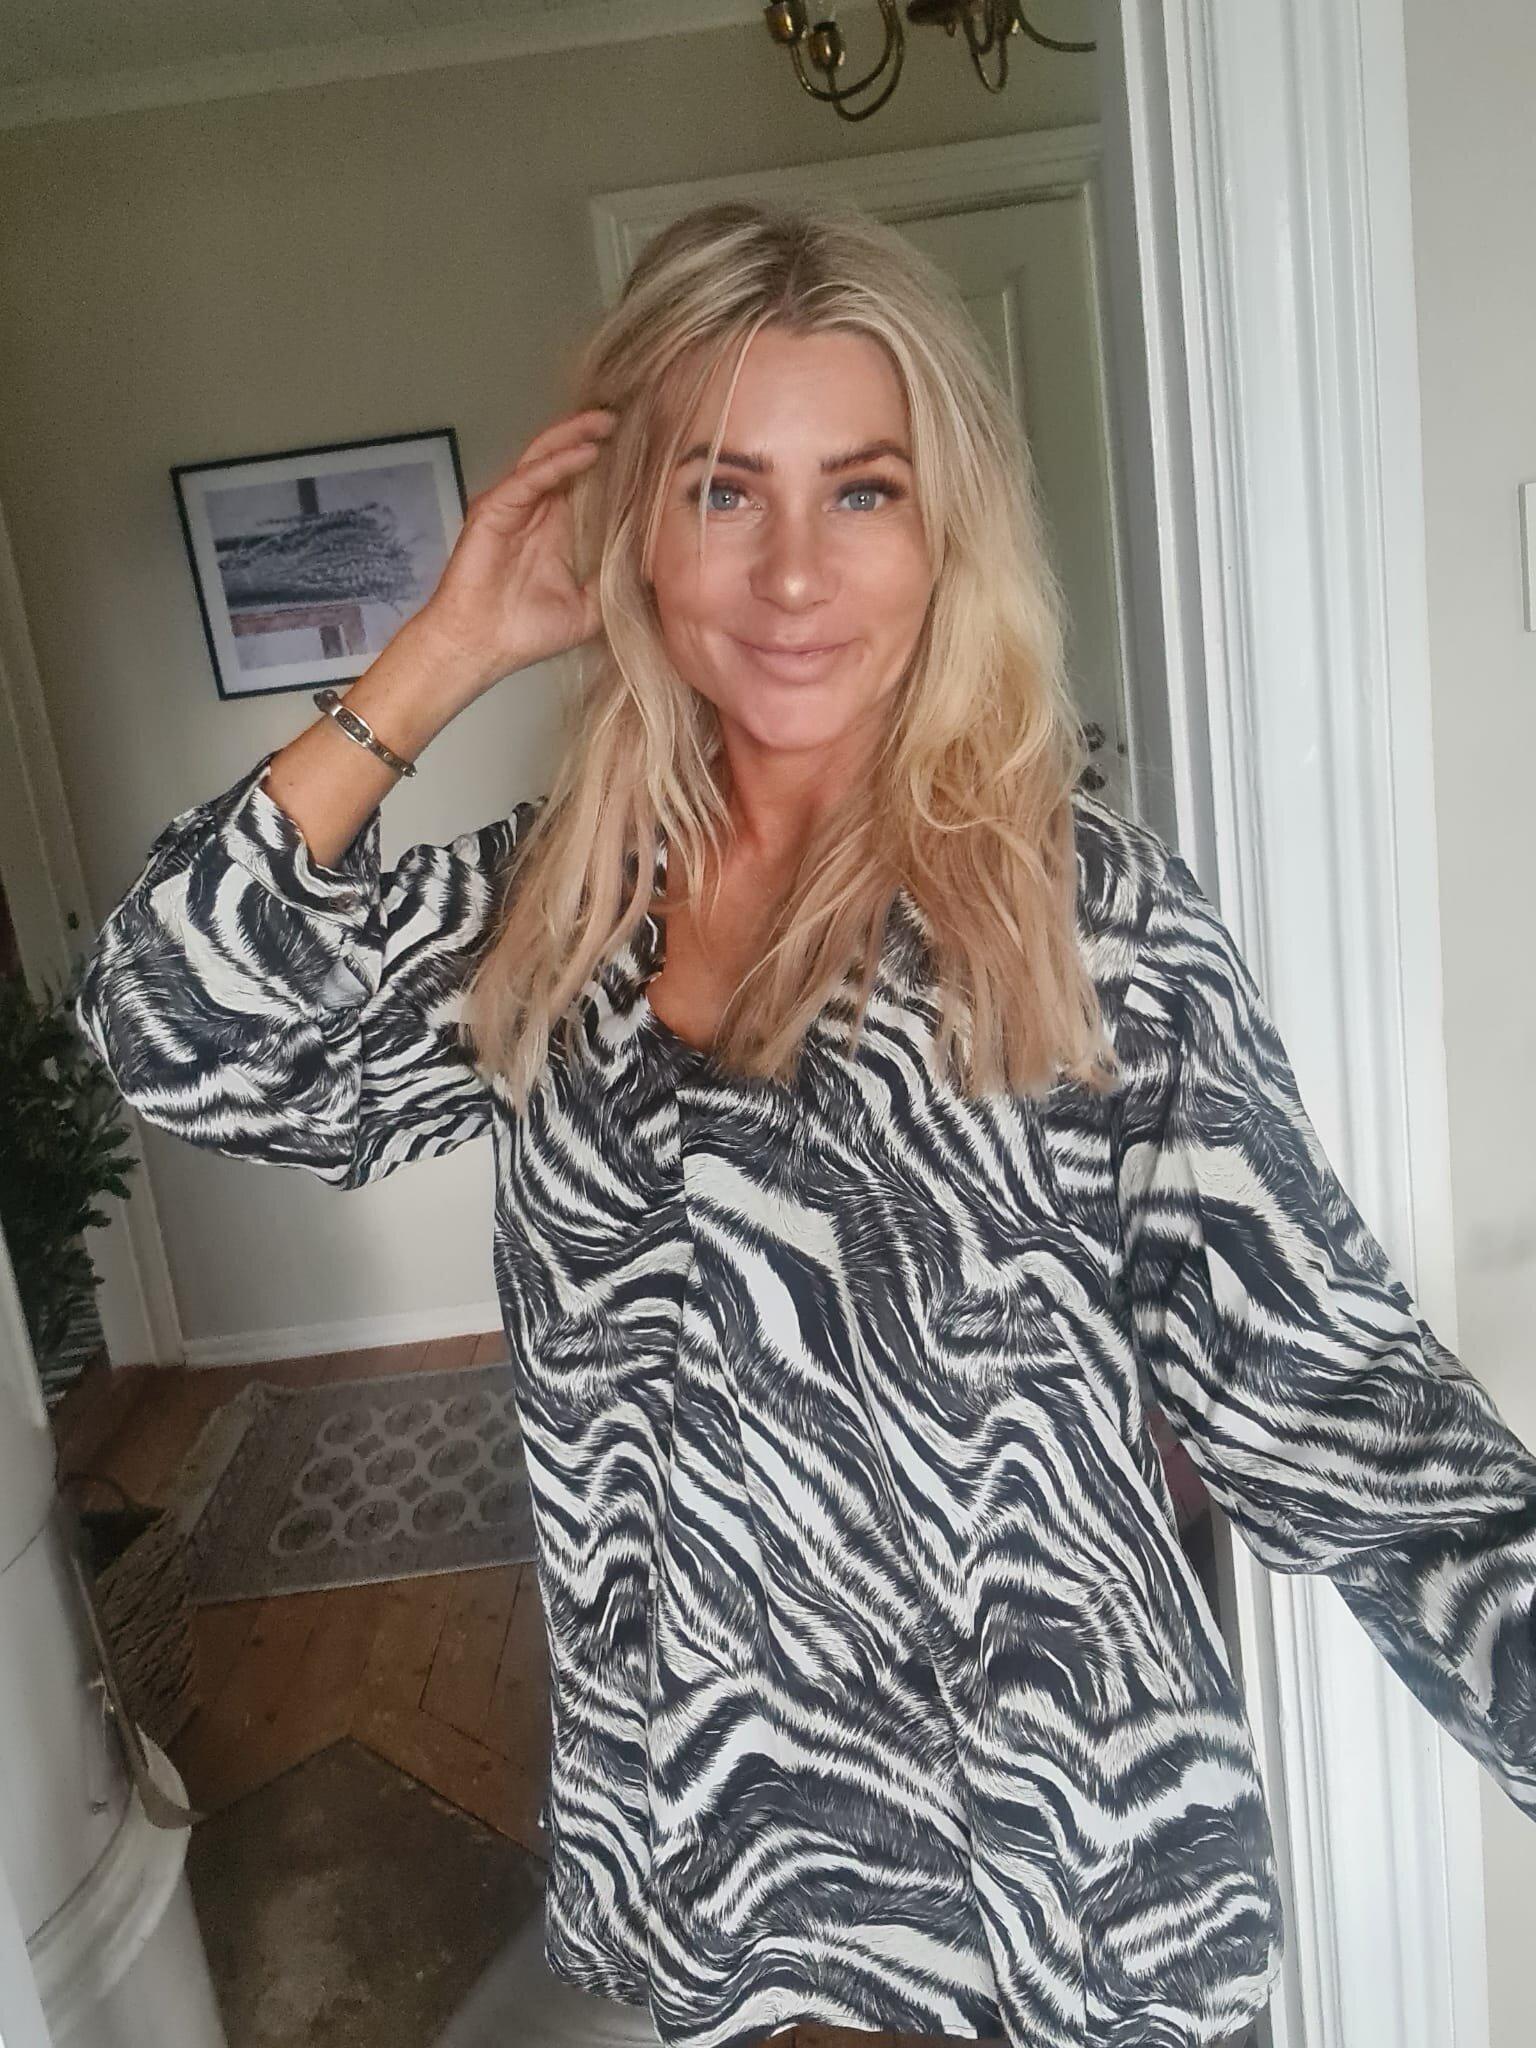 Helena blouse - Zebra pattern - Black/Cream